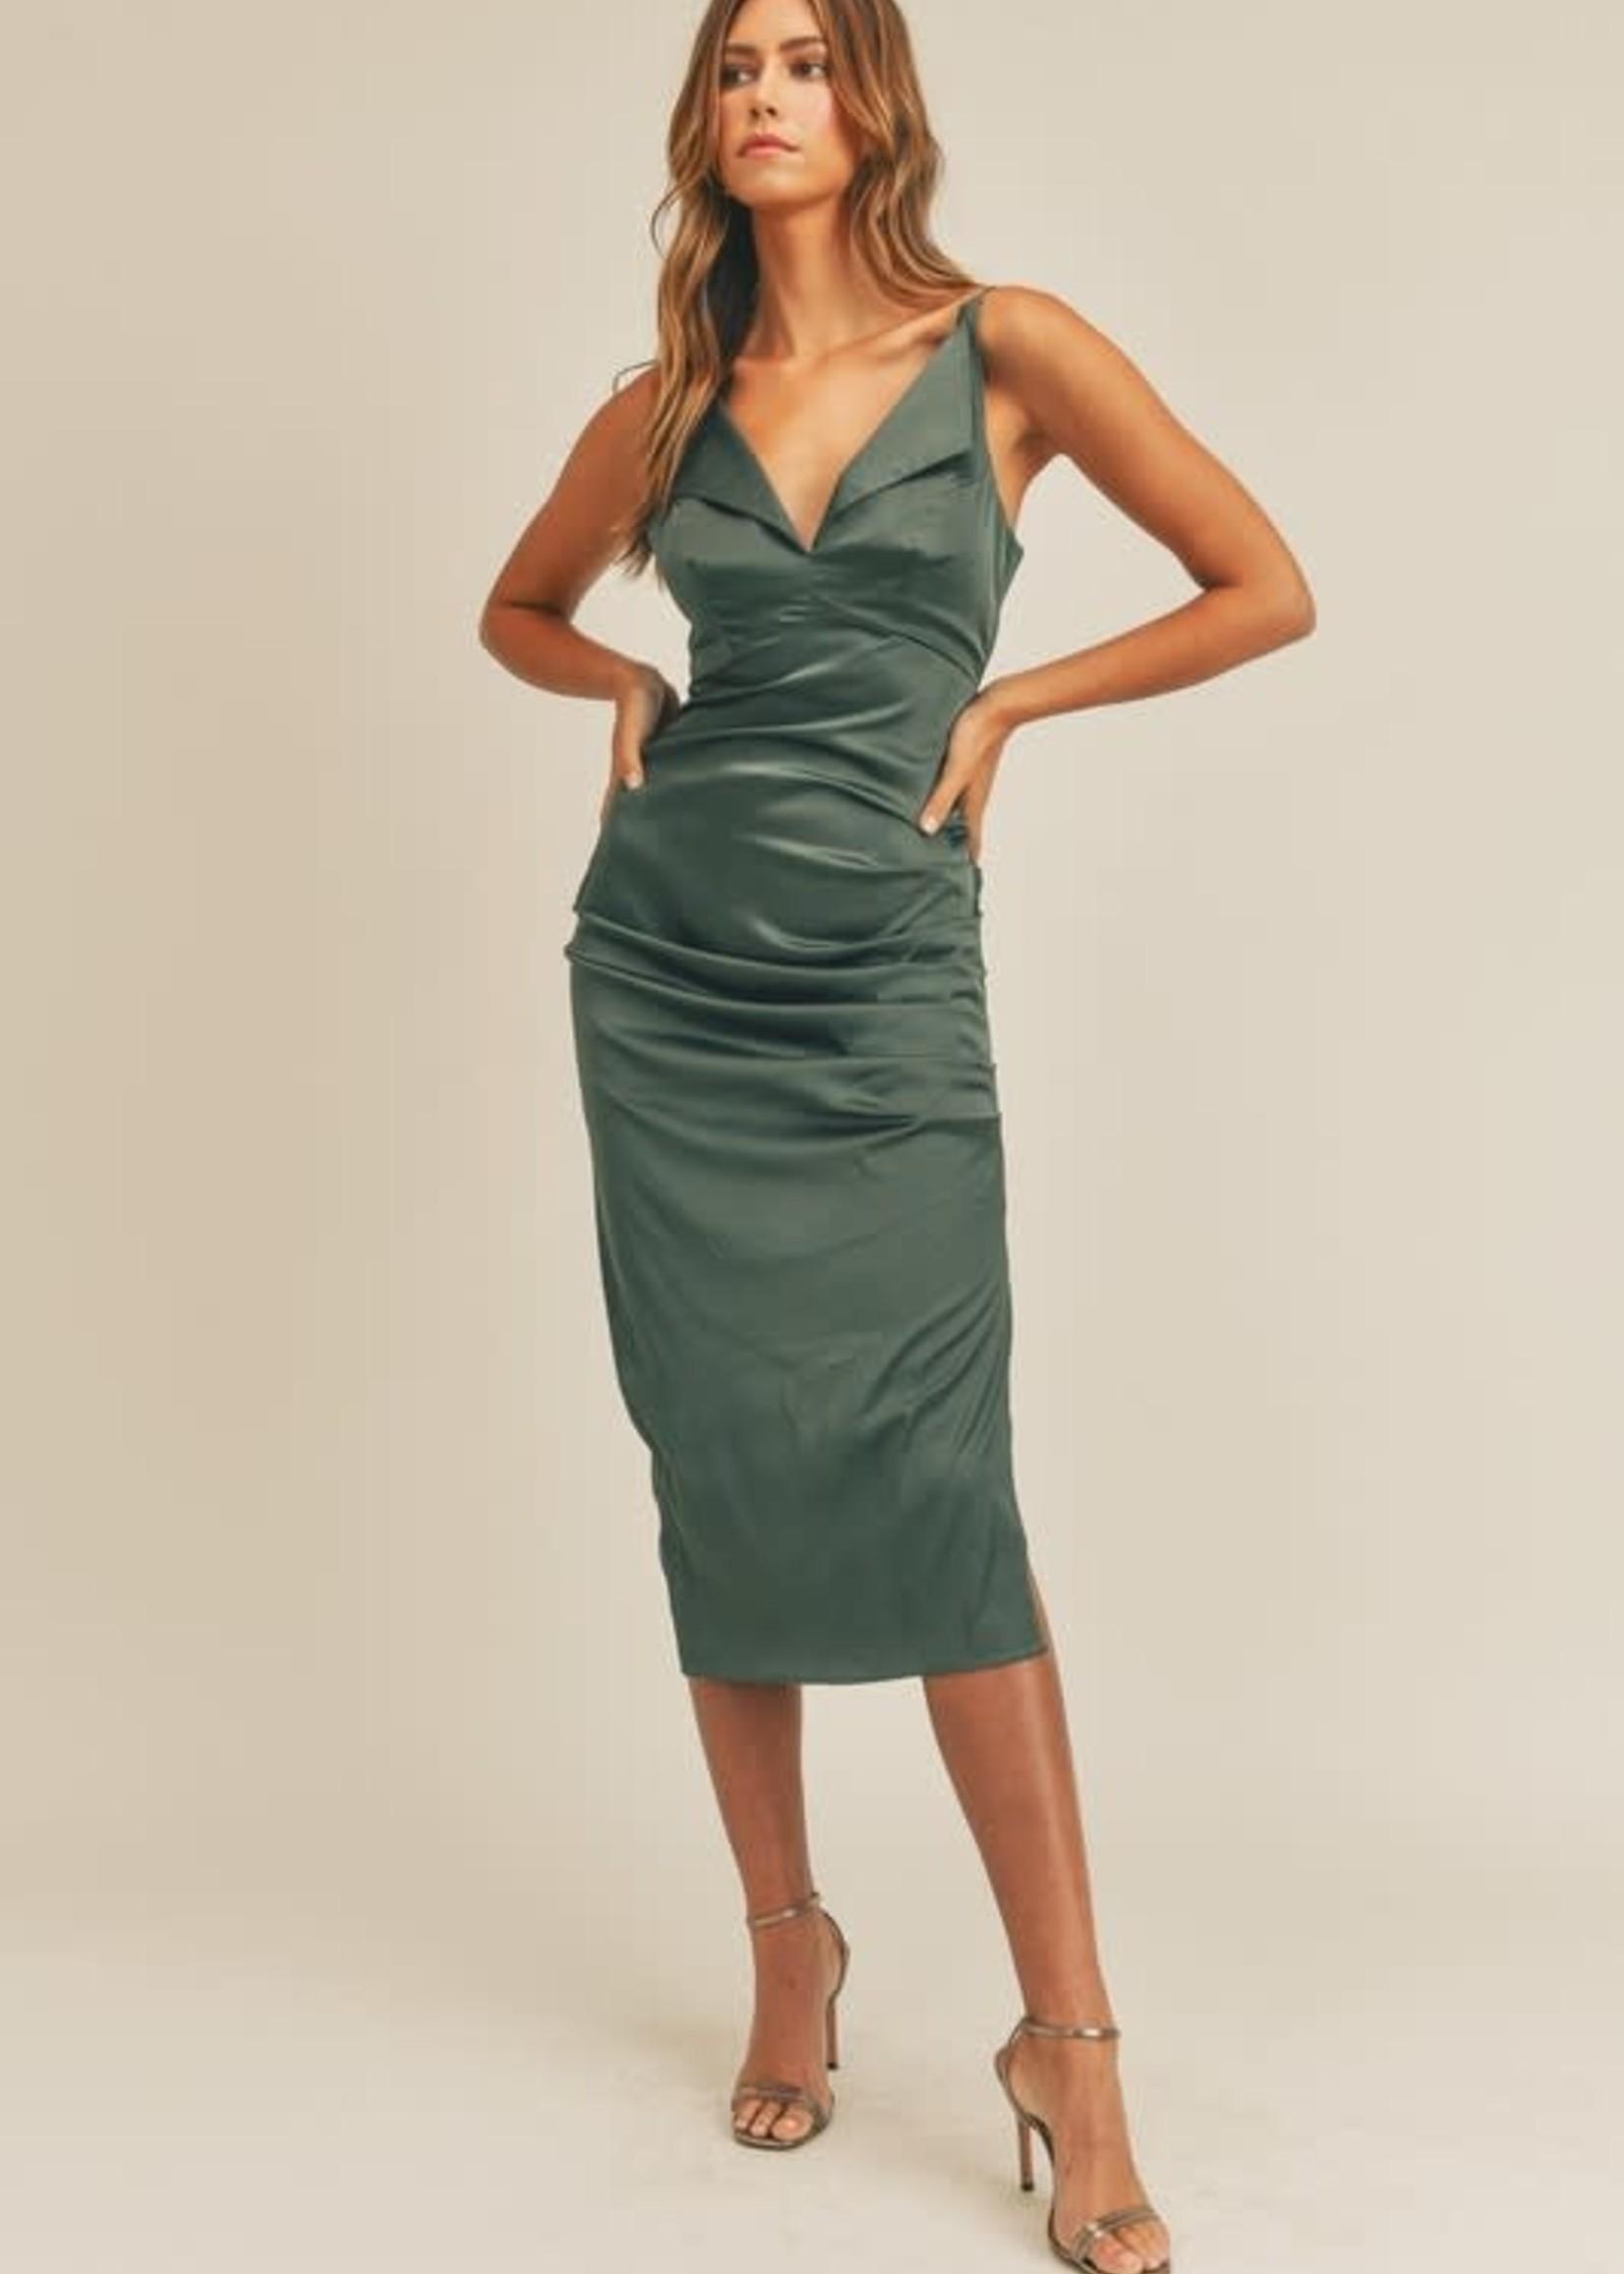 Make It Count Midi Dress (3 Colors)